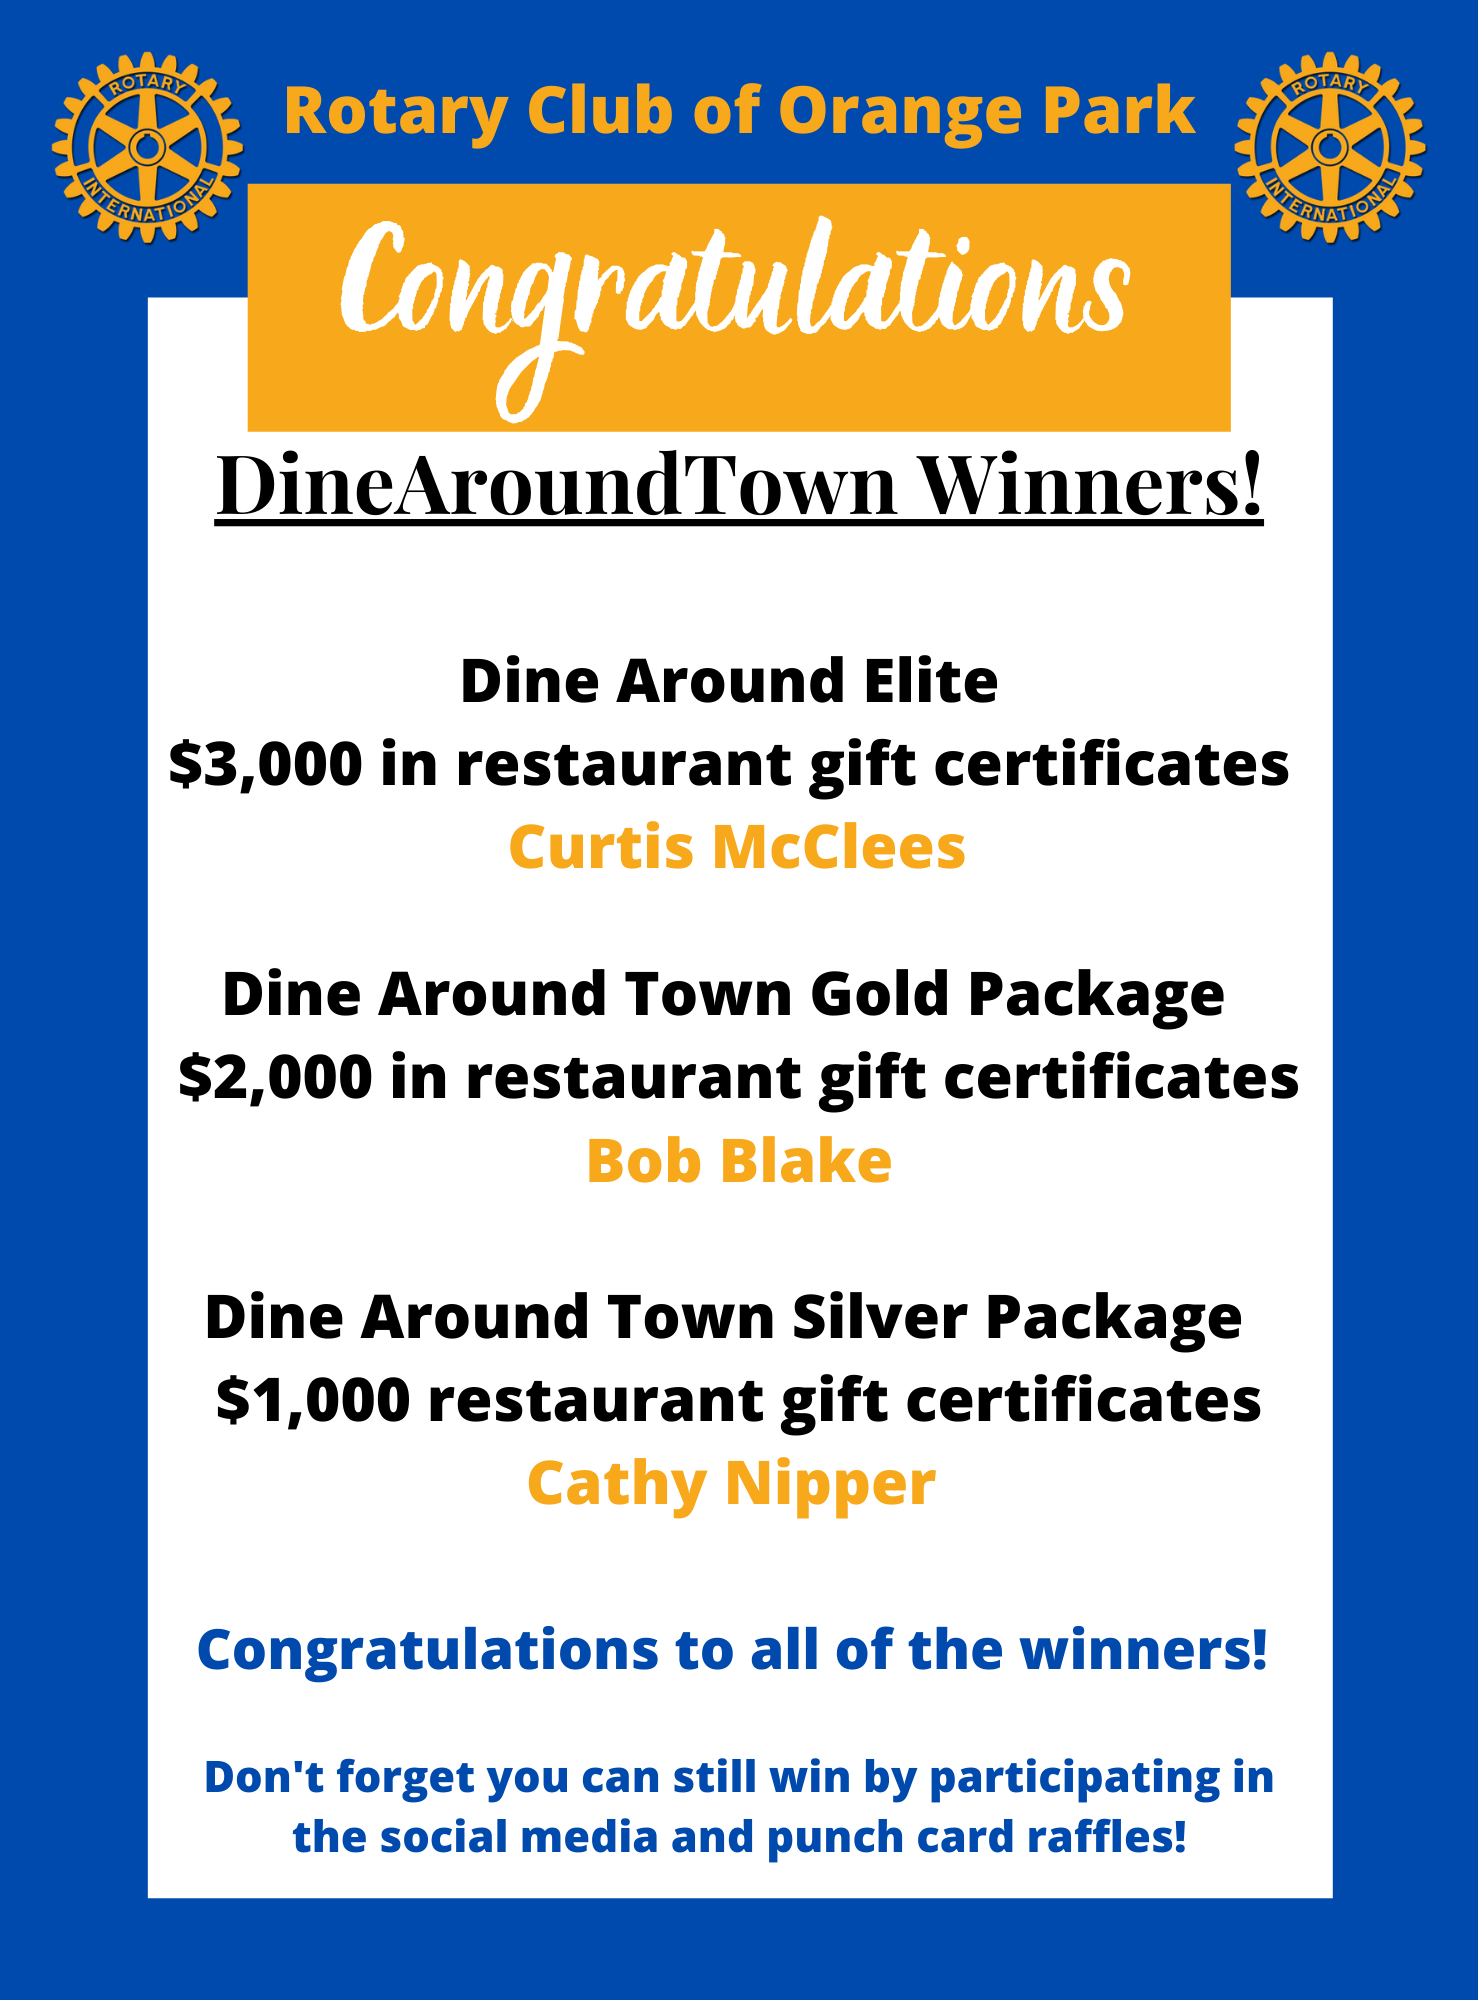 Dinearound winners (1)